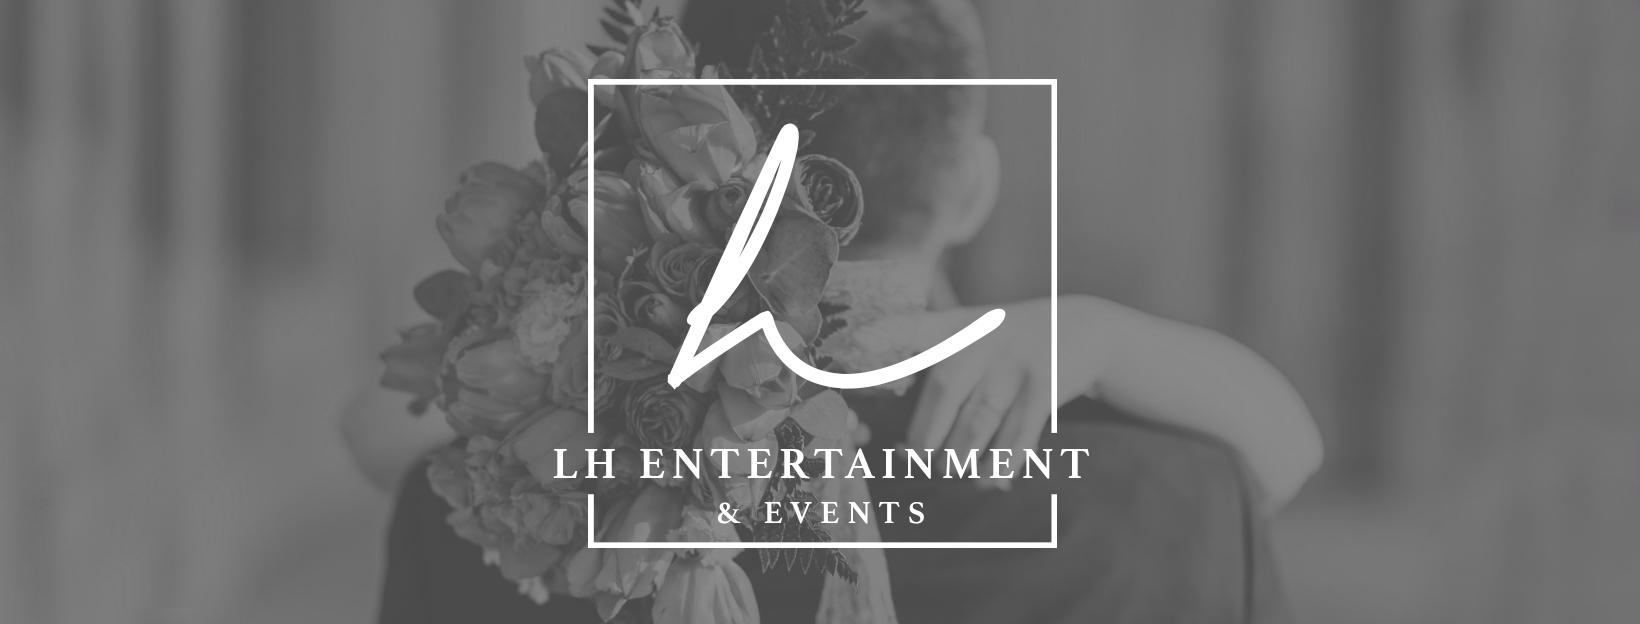 lh-events-timeline